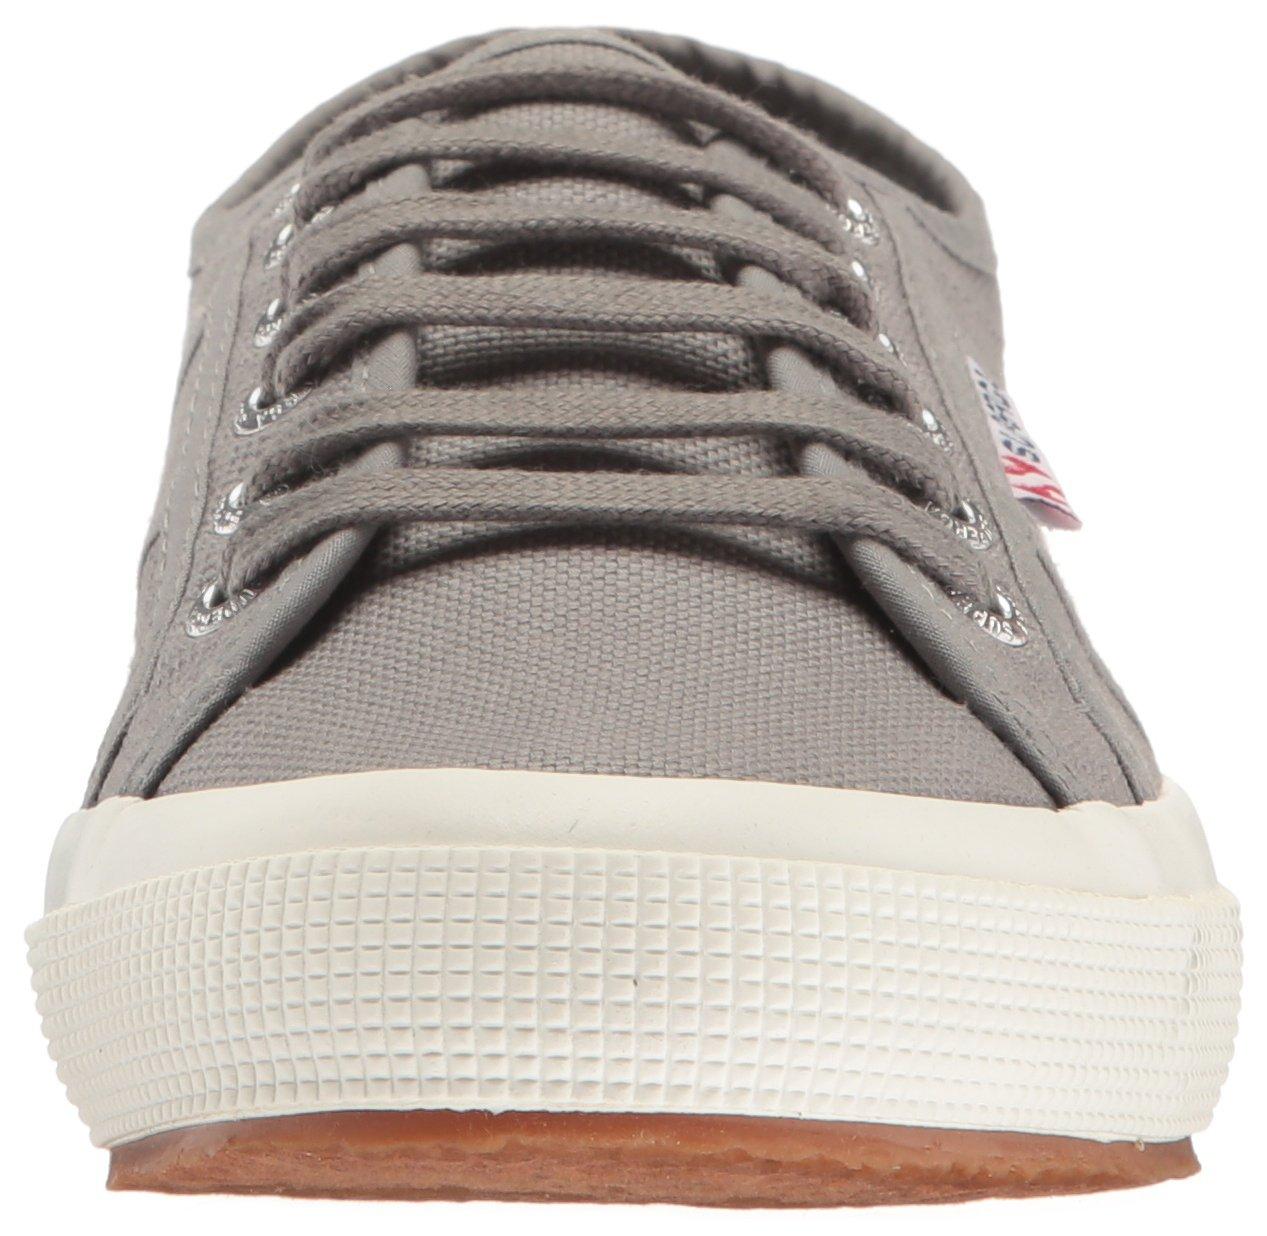 Superga Unisex 2750 Cotu  Grey Sage Classic Sneaker - 39 M EU / 8.5 B(M) US Women / 7 D(M) US Men